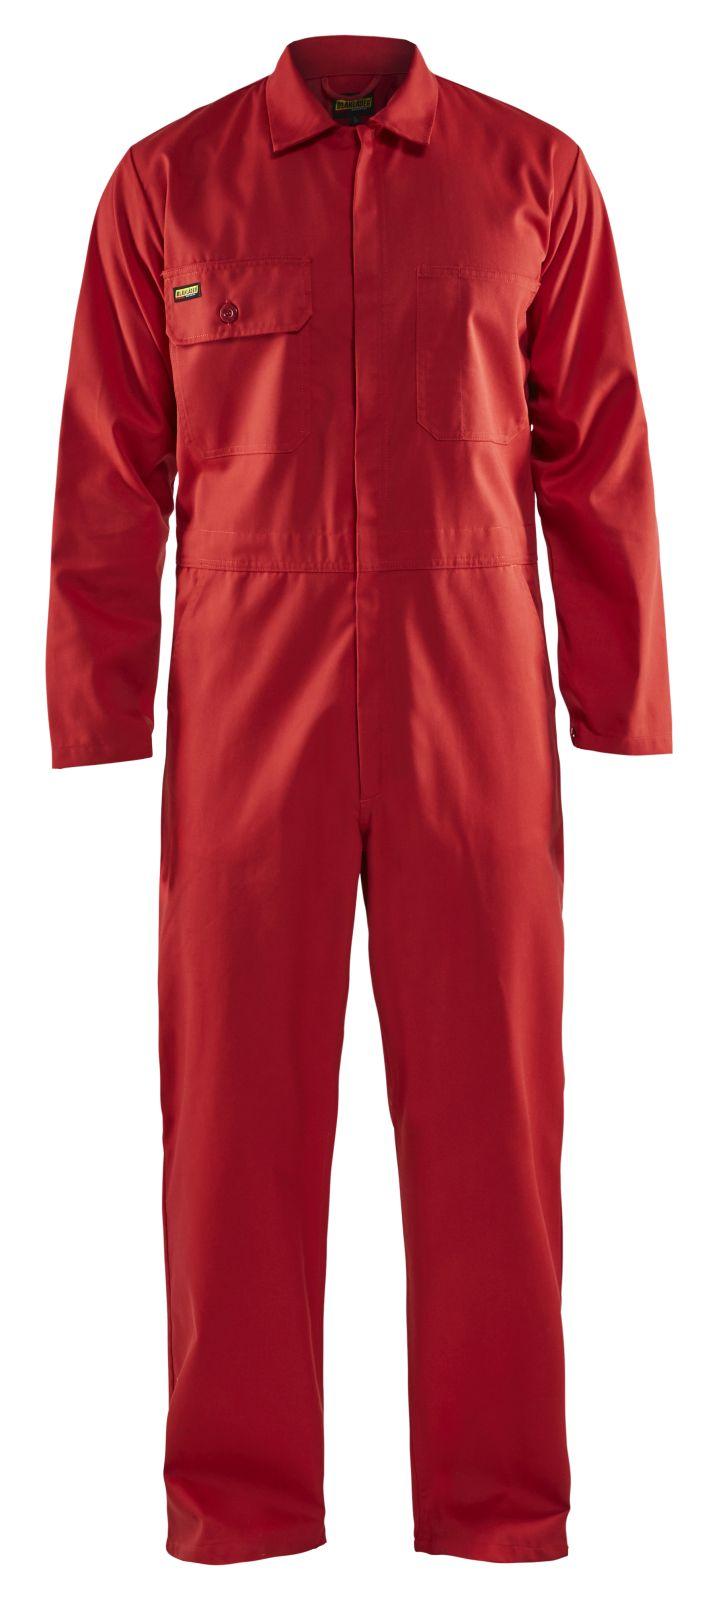 Blaklader Overalls 62701800 rood(5600)